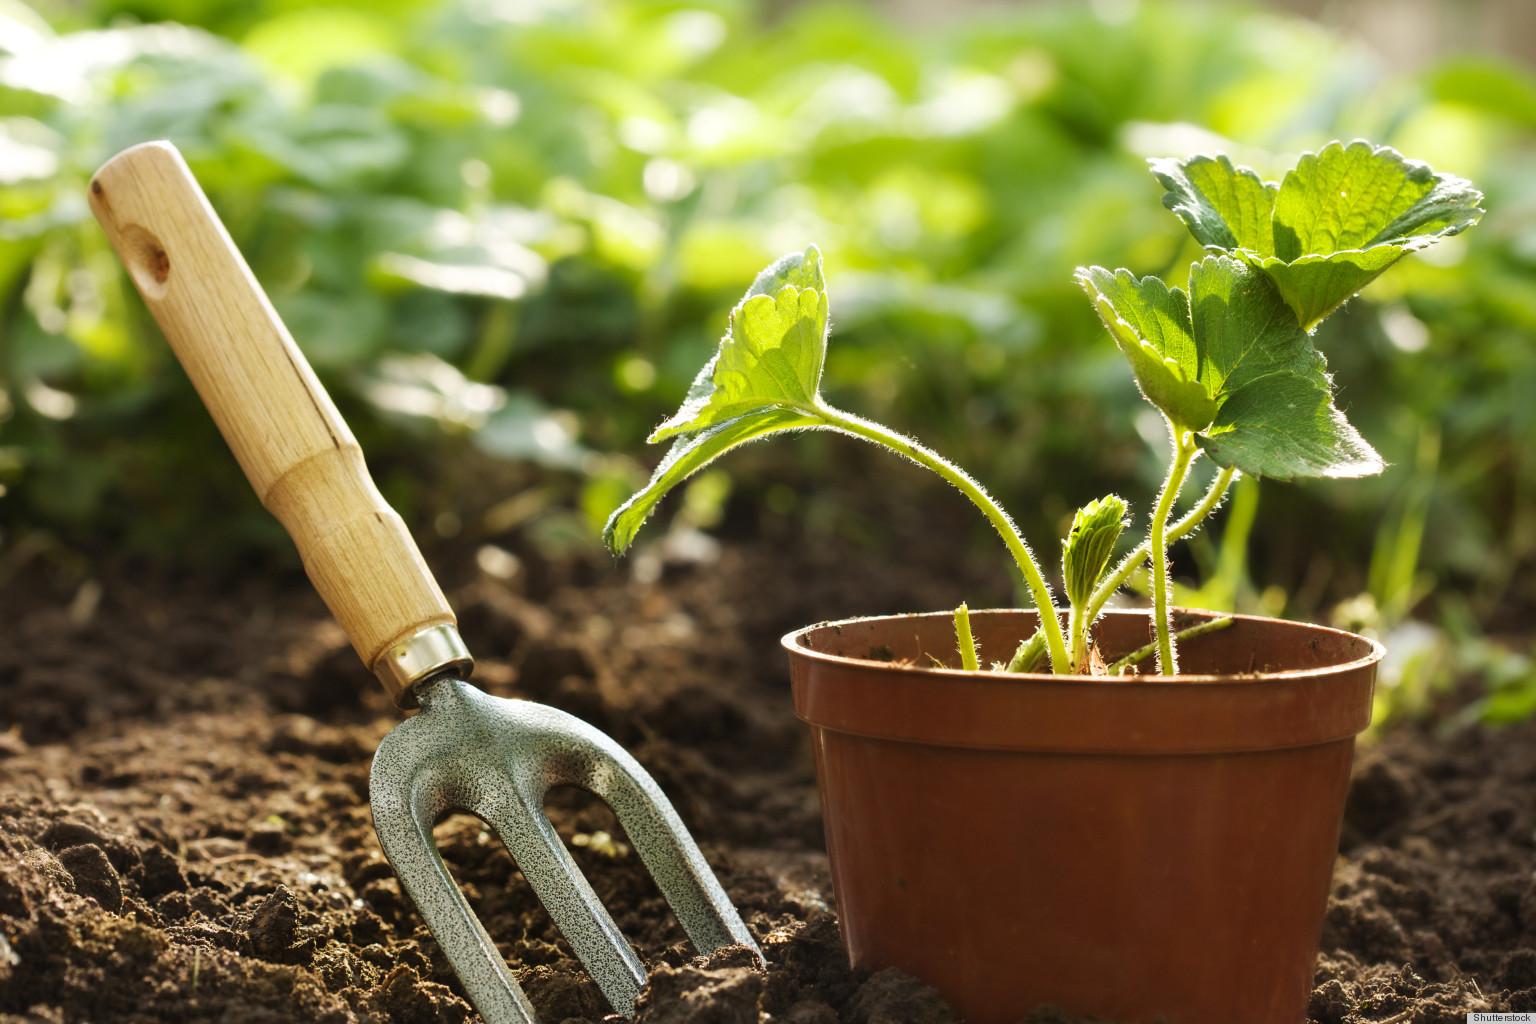 The Best Gardening Tools